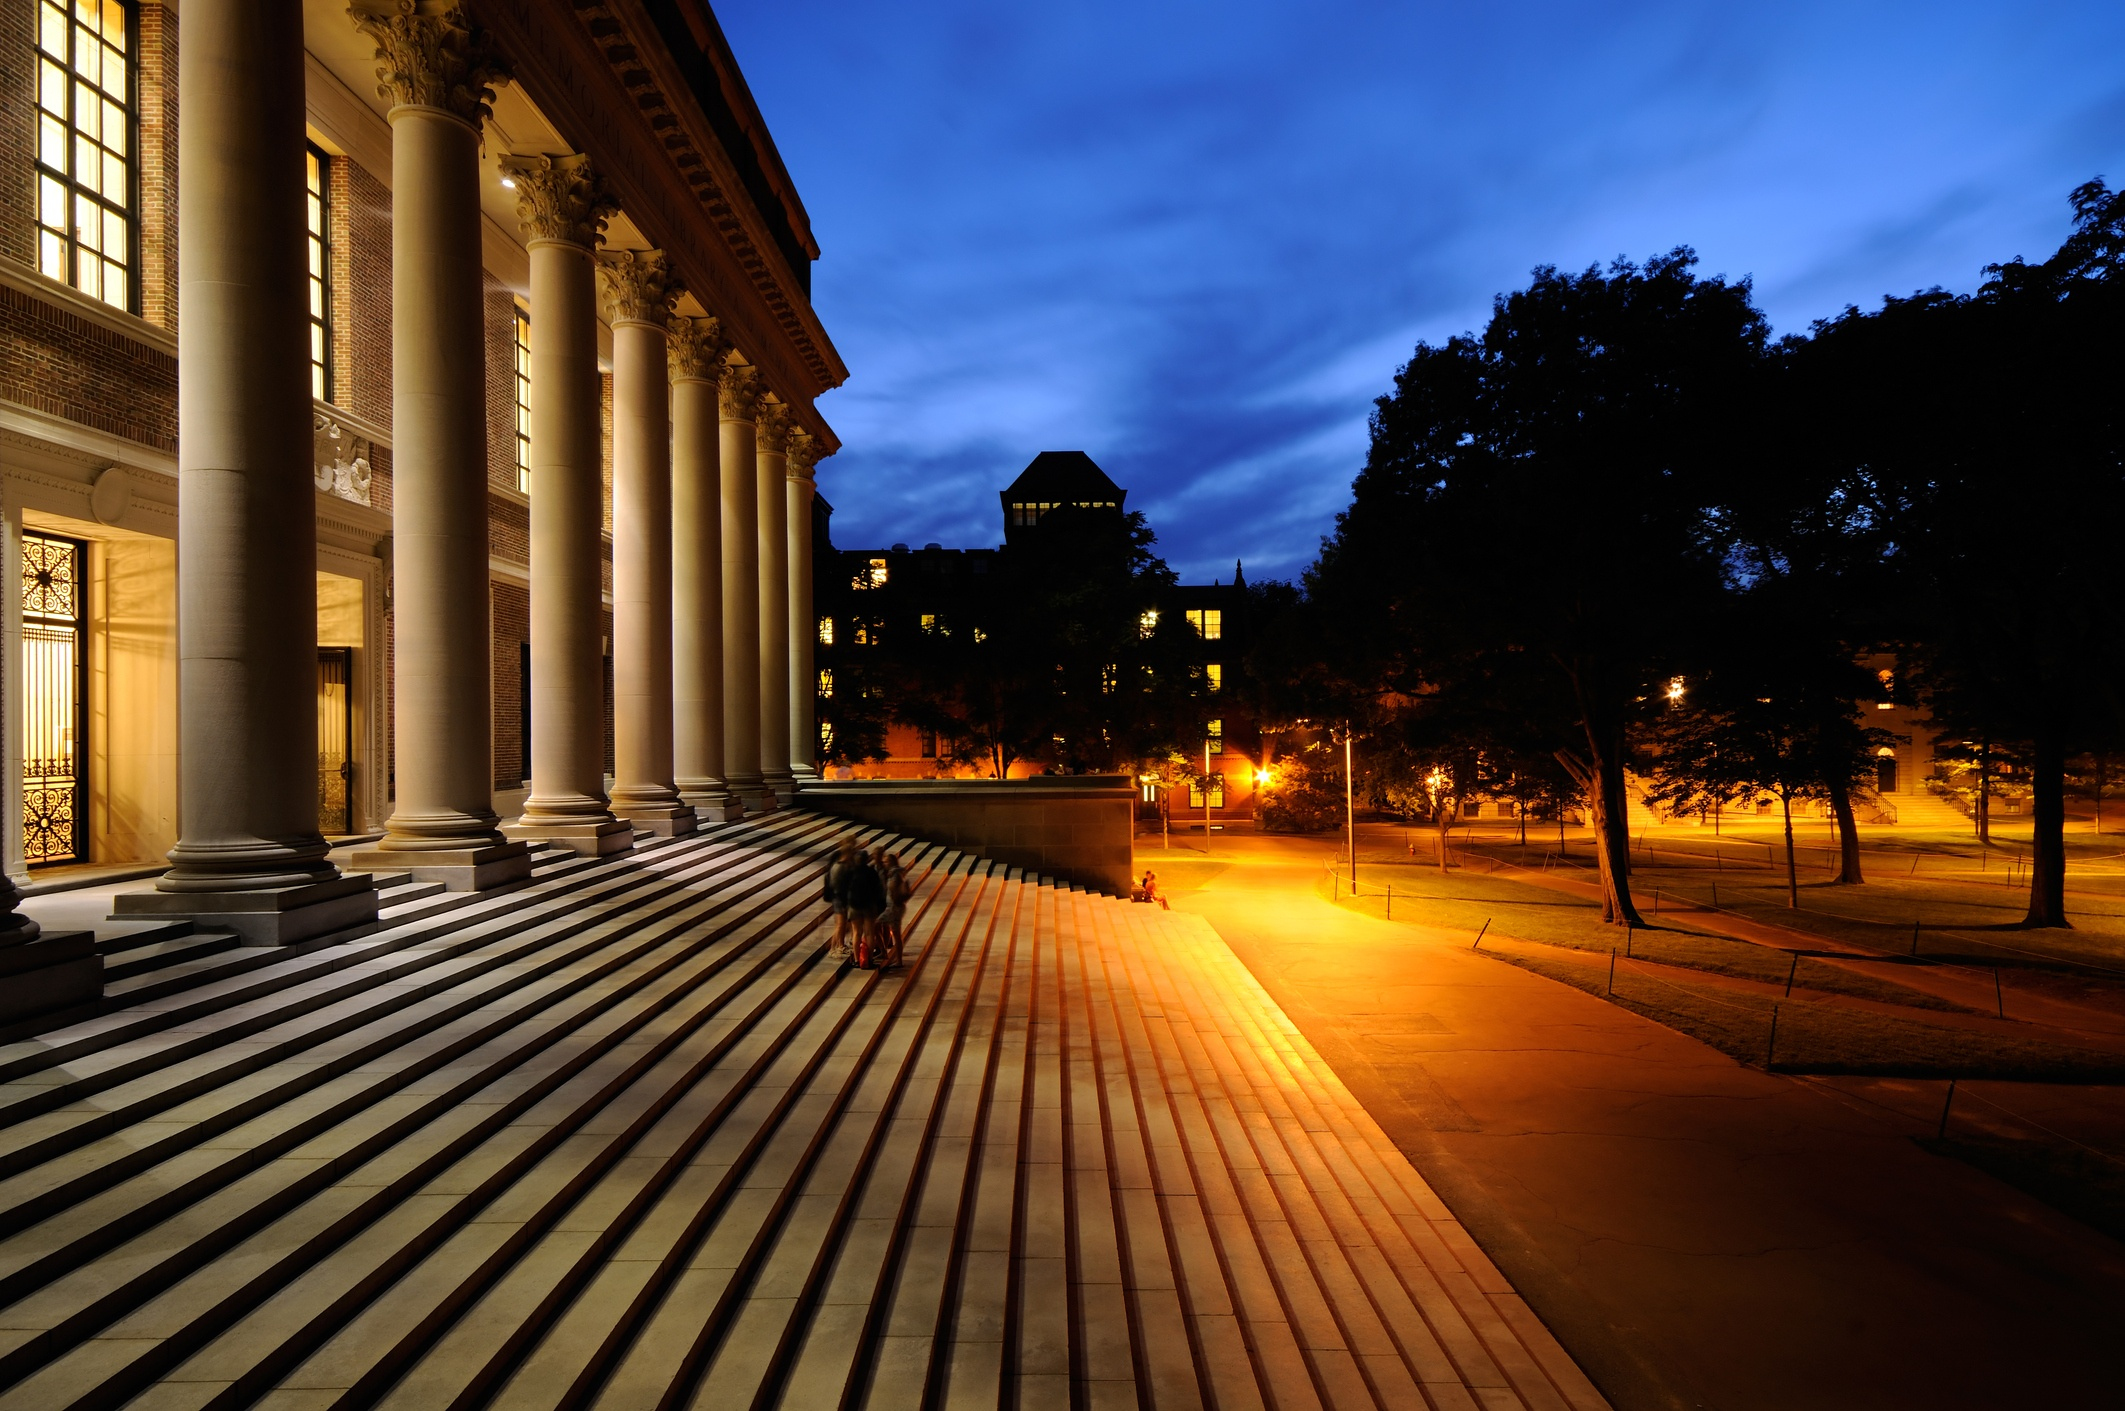 College Campus in the Evening